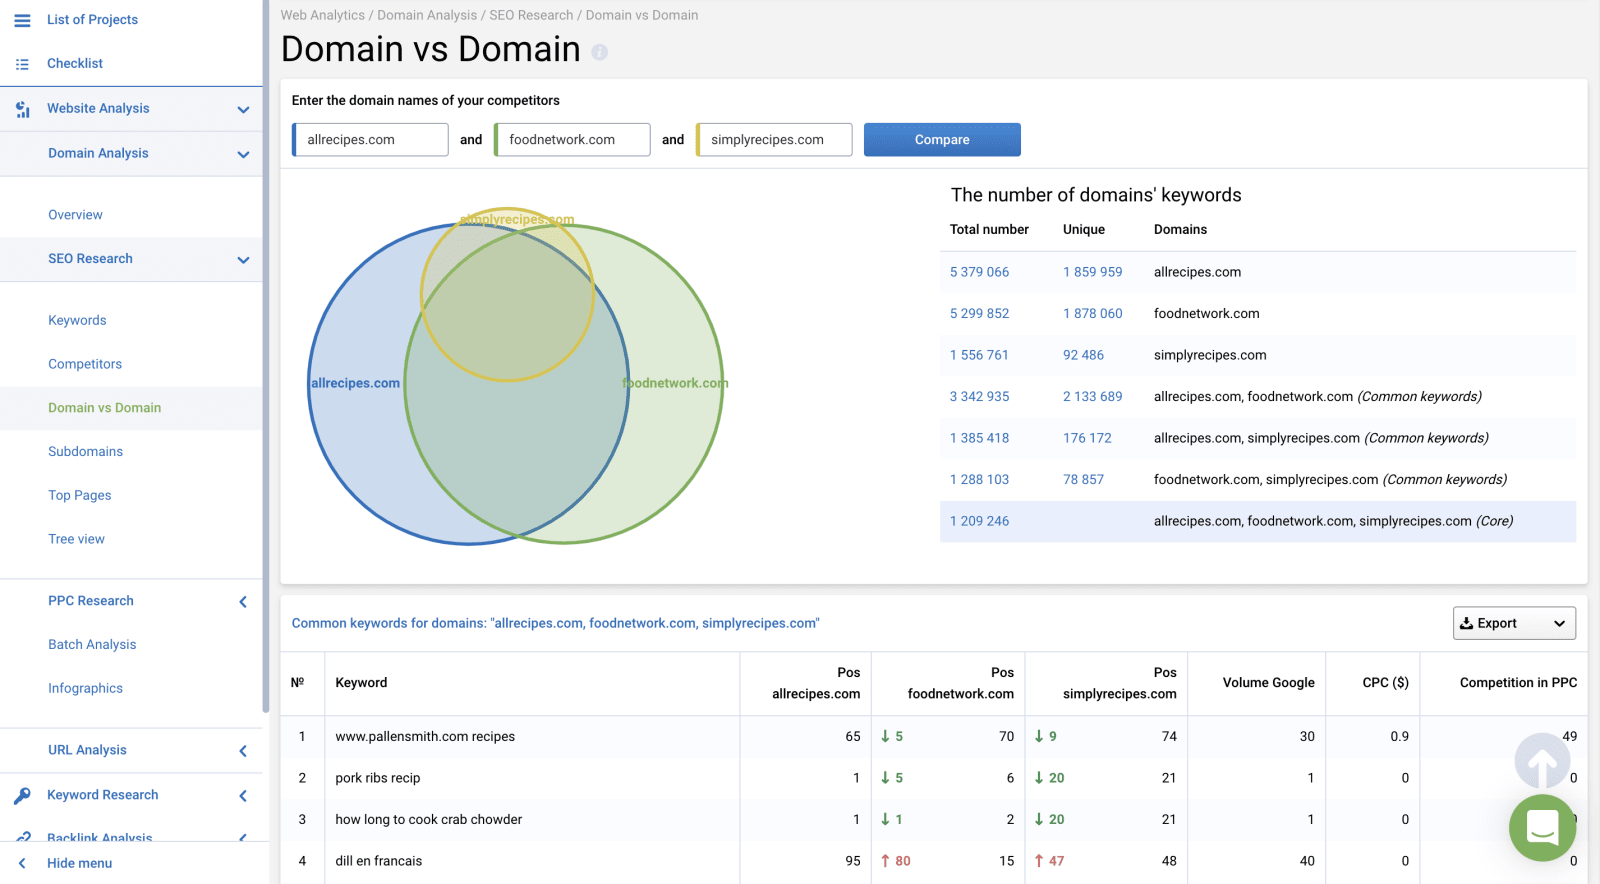 Serpstat SEO Research Competitors Venn Diagram